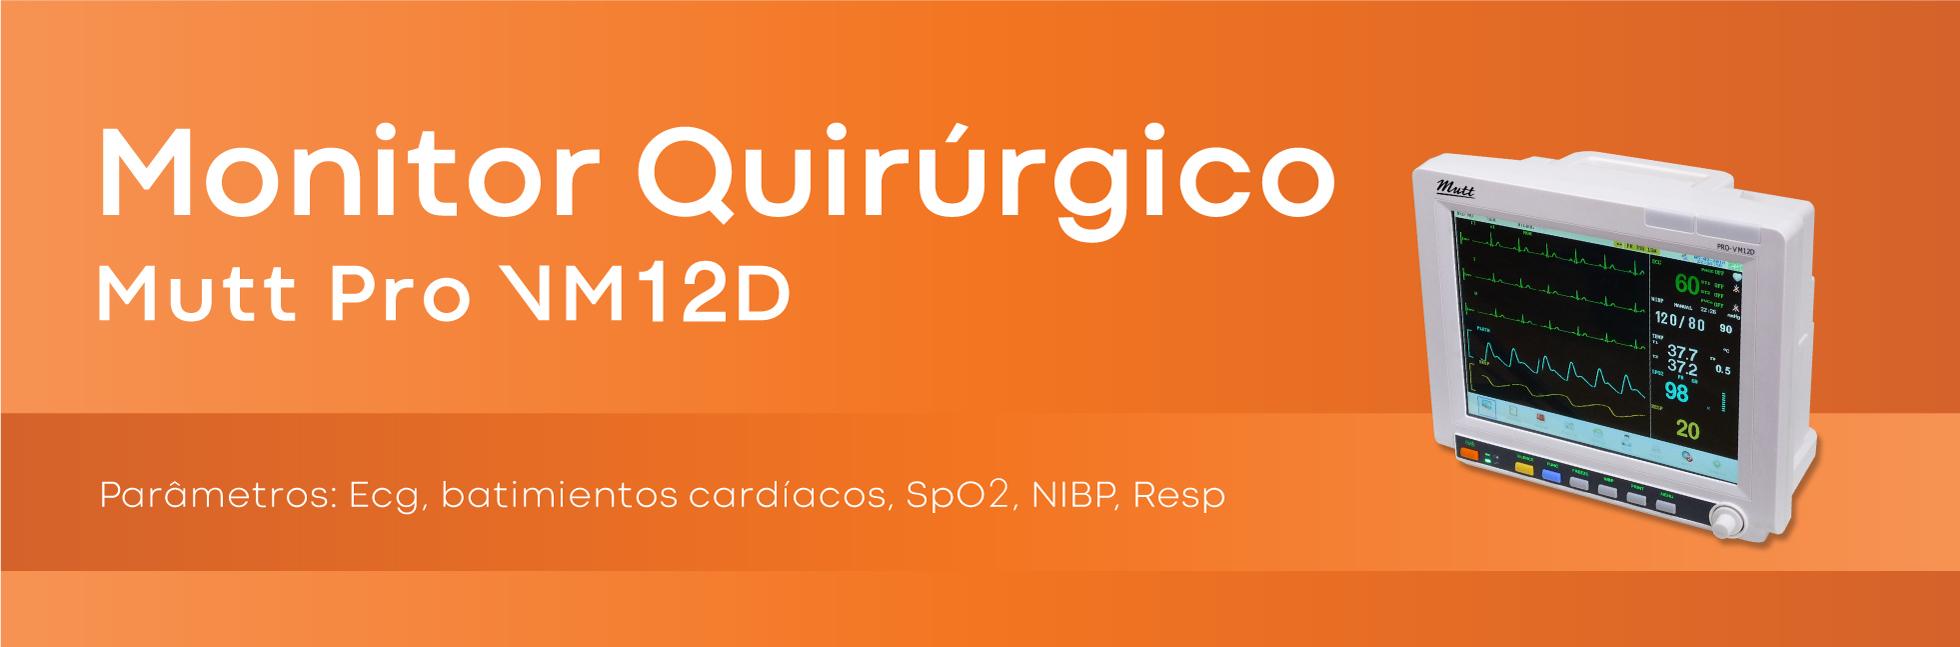 catalog/banners/ES_monitor-cirurgico.jpg